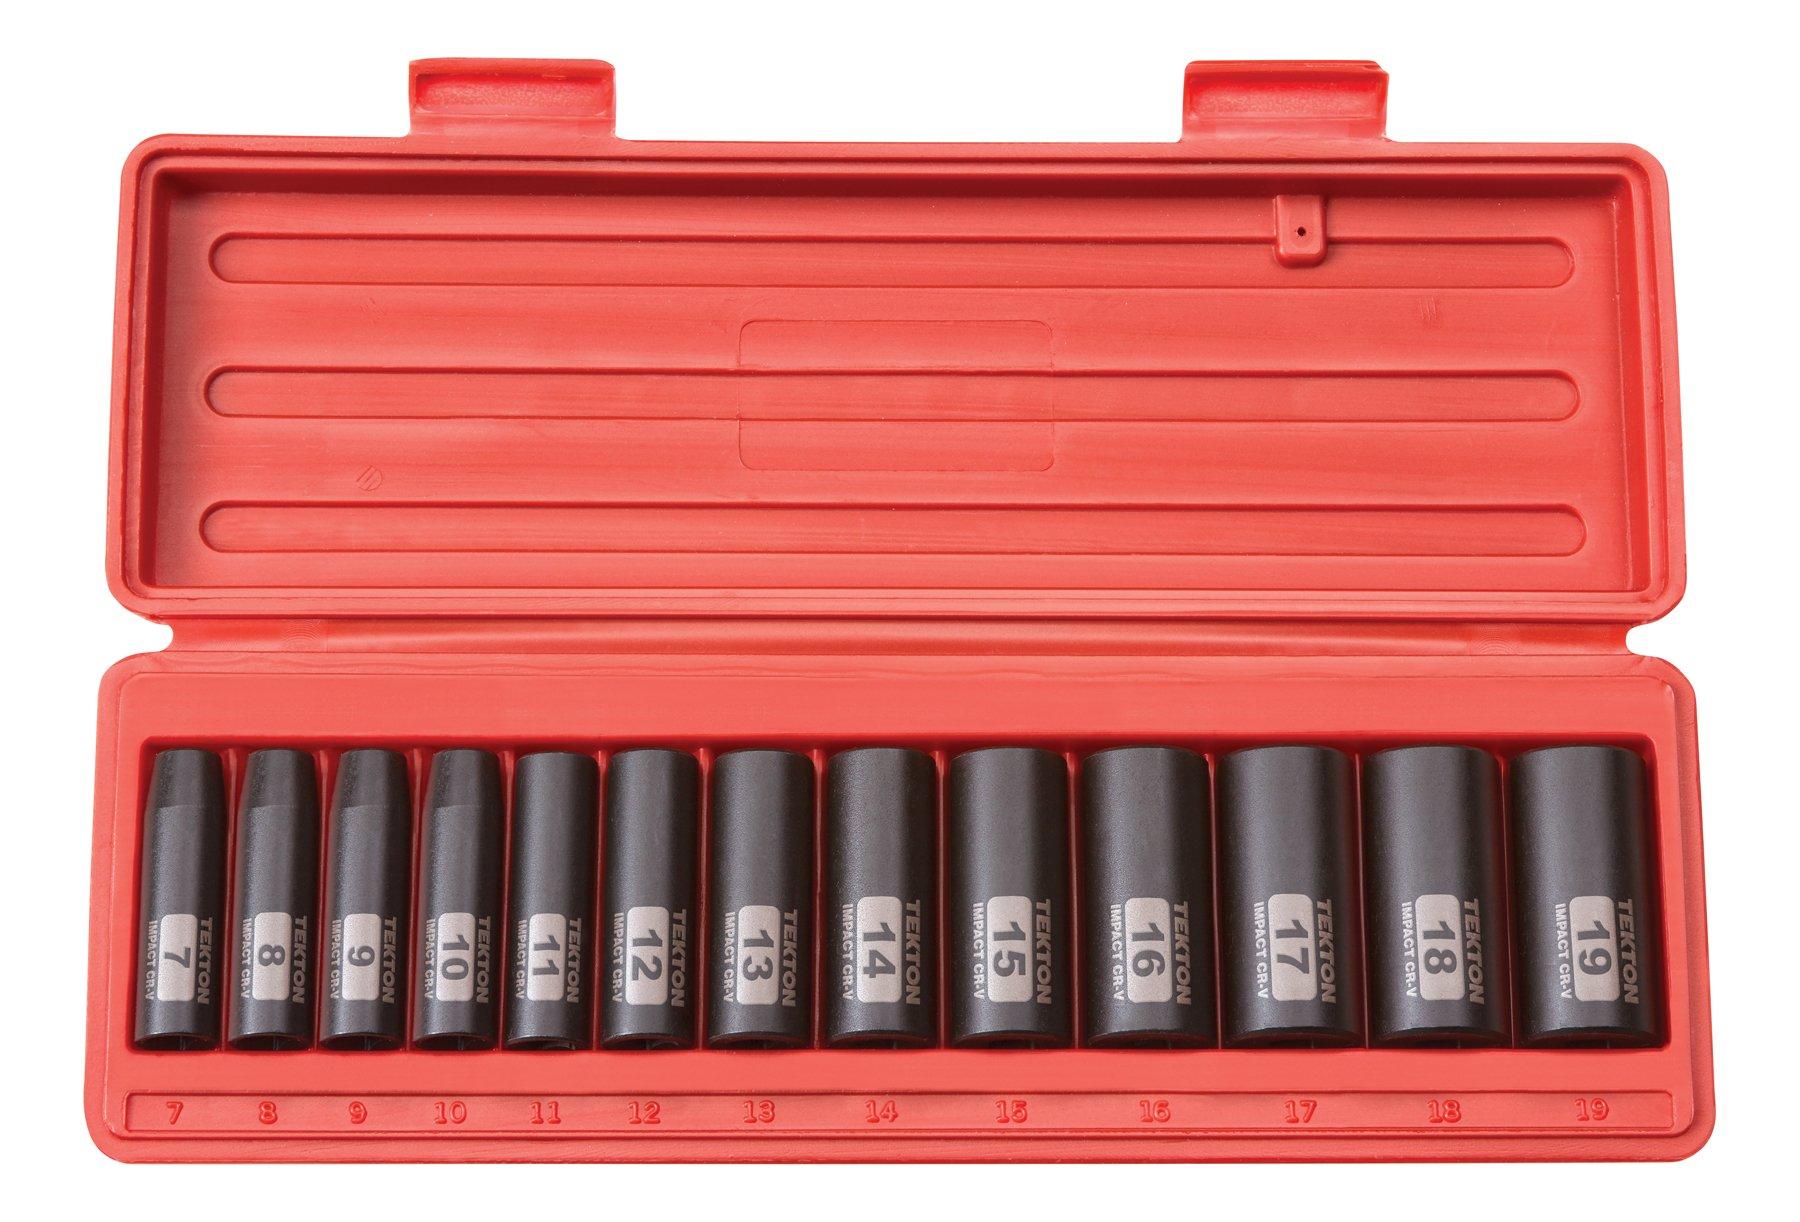 TEKTON 3/8-Inch Drive Deep Impact Socket Set, Metric, Cr-V, 6-Point, 7 mm - 19 mm, 13-Sockets | 47925 by TEKTON